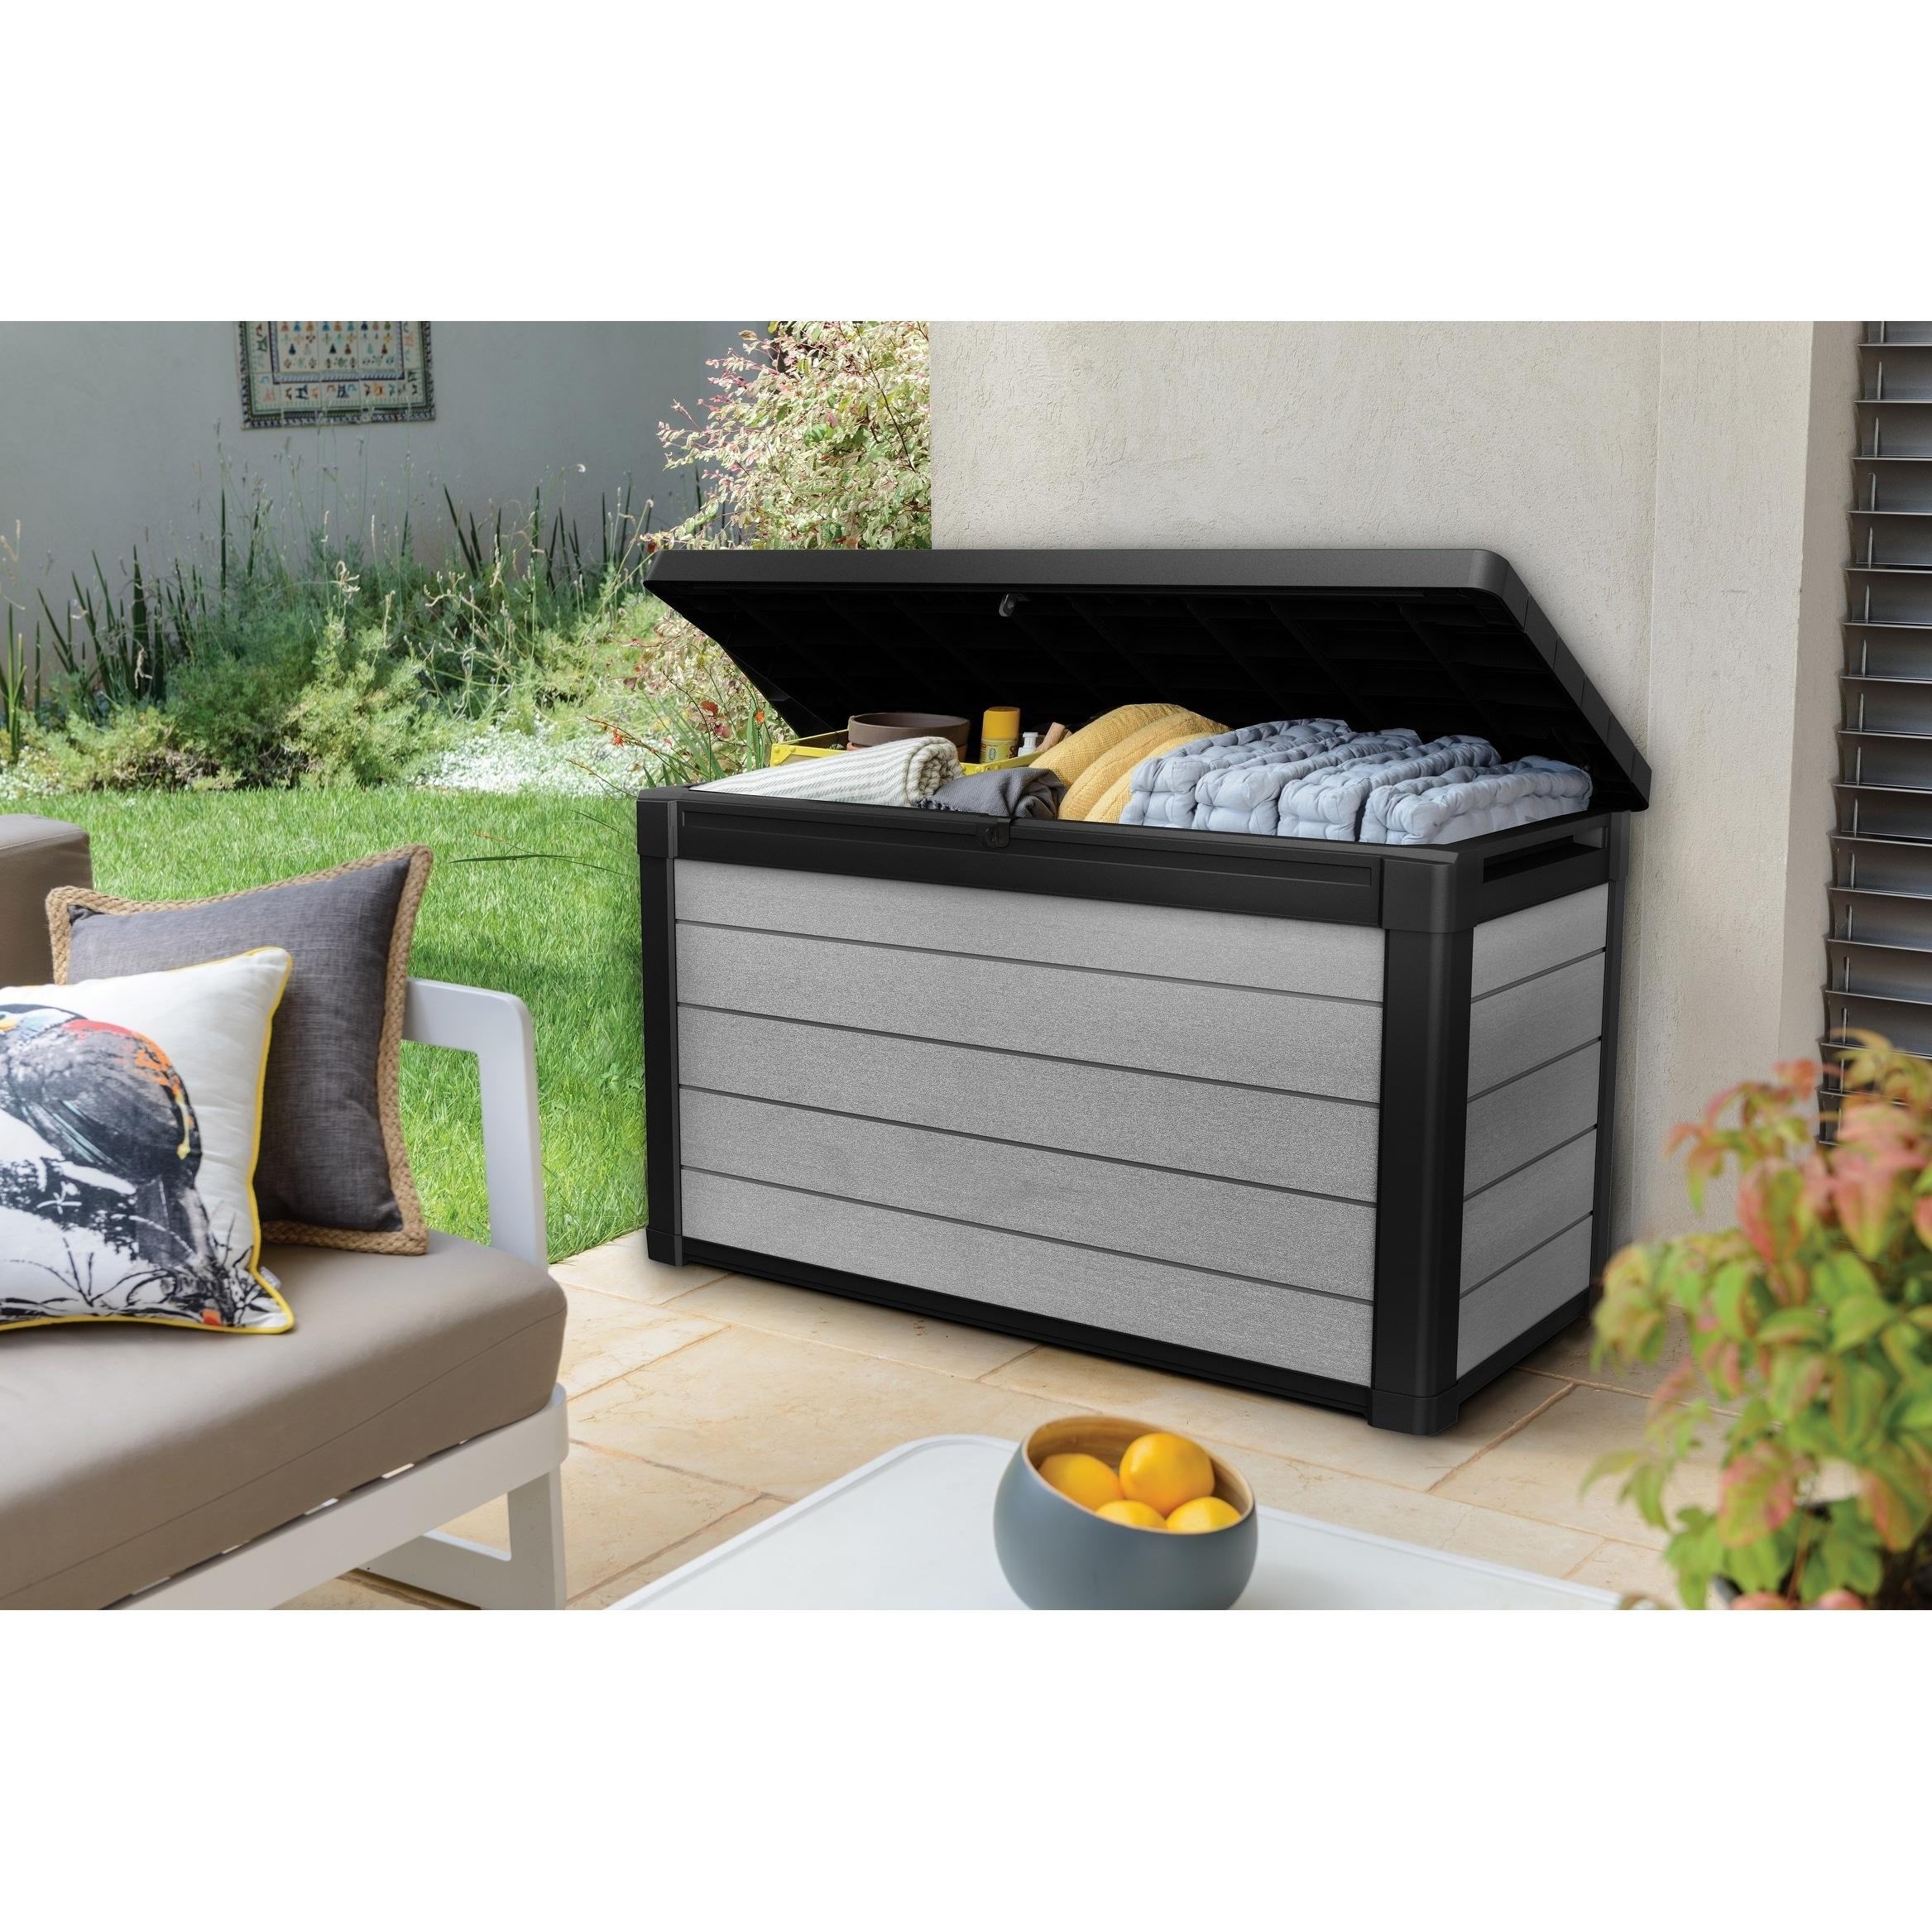 Keter Denali Duotech 100 Gallon Plastic Resin Deck Box Free Shipping Today 22814508